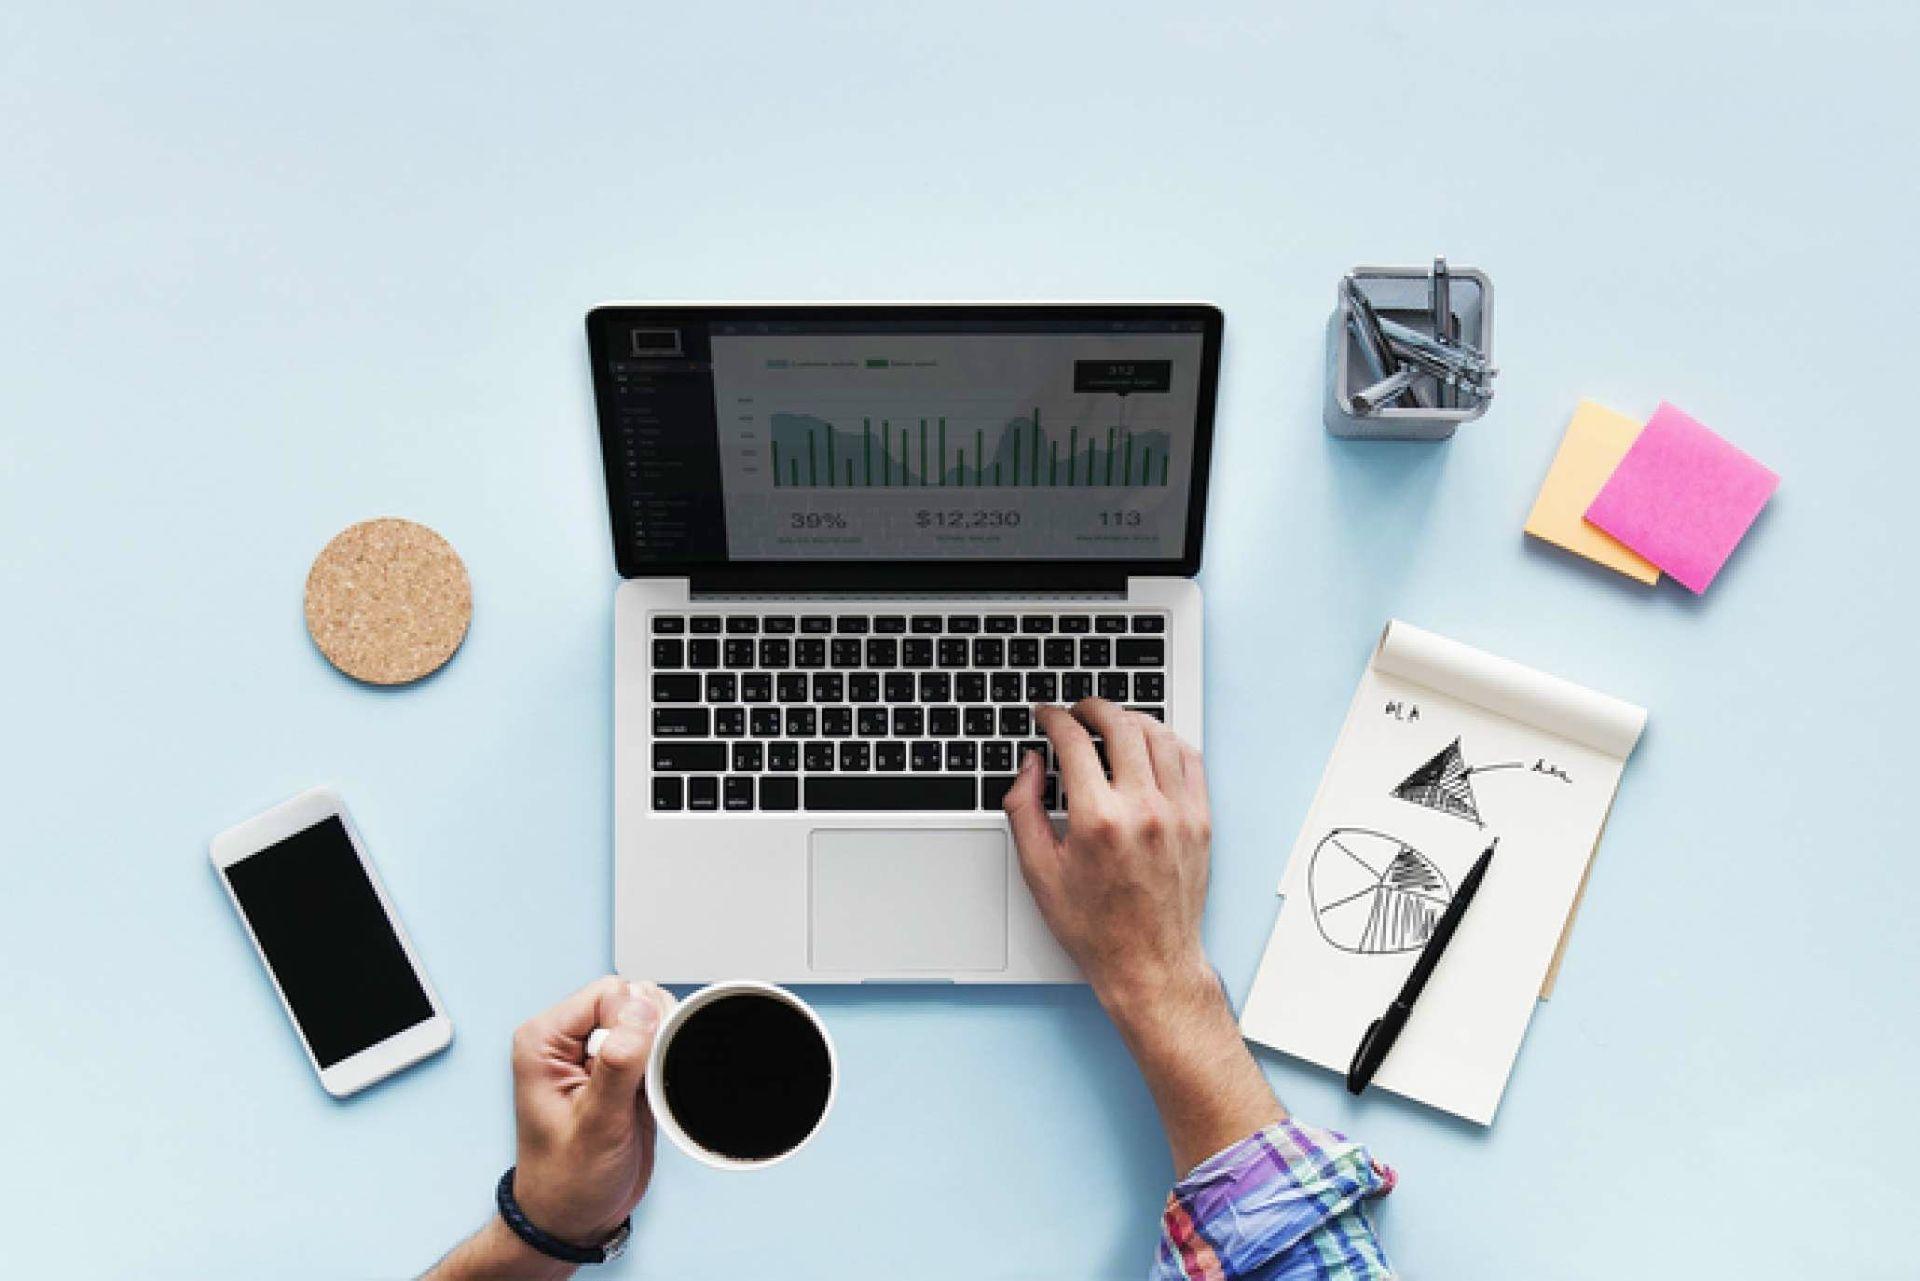 blog_ultimate_guide_to_easy_digital_upskilling_2060_1374_60_s-digital-marketing